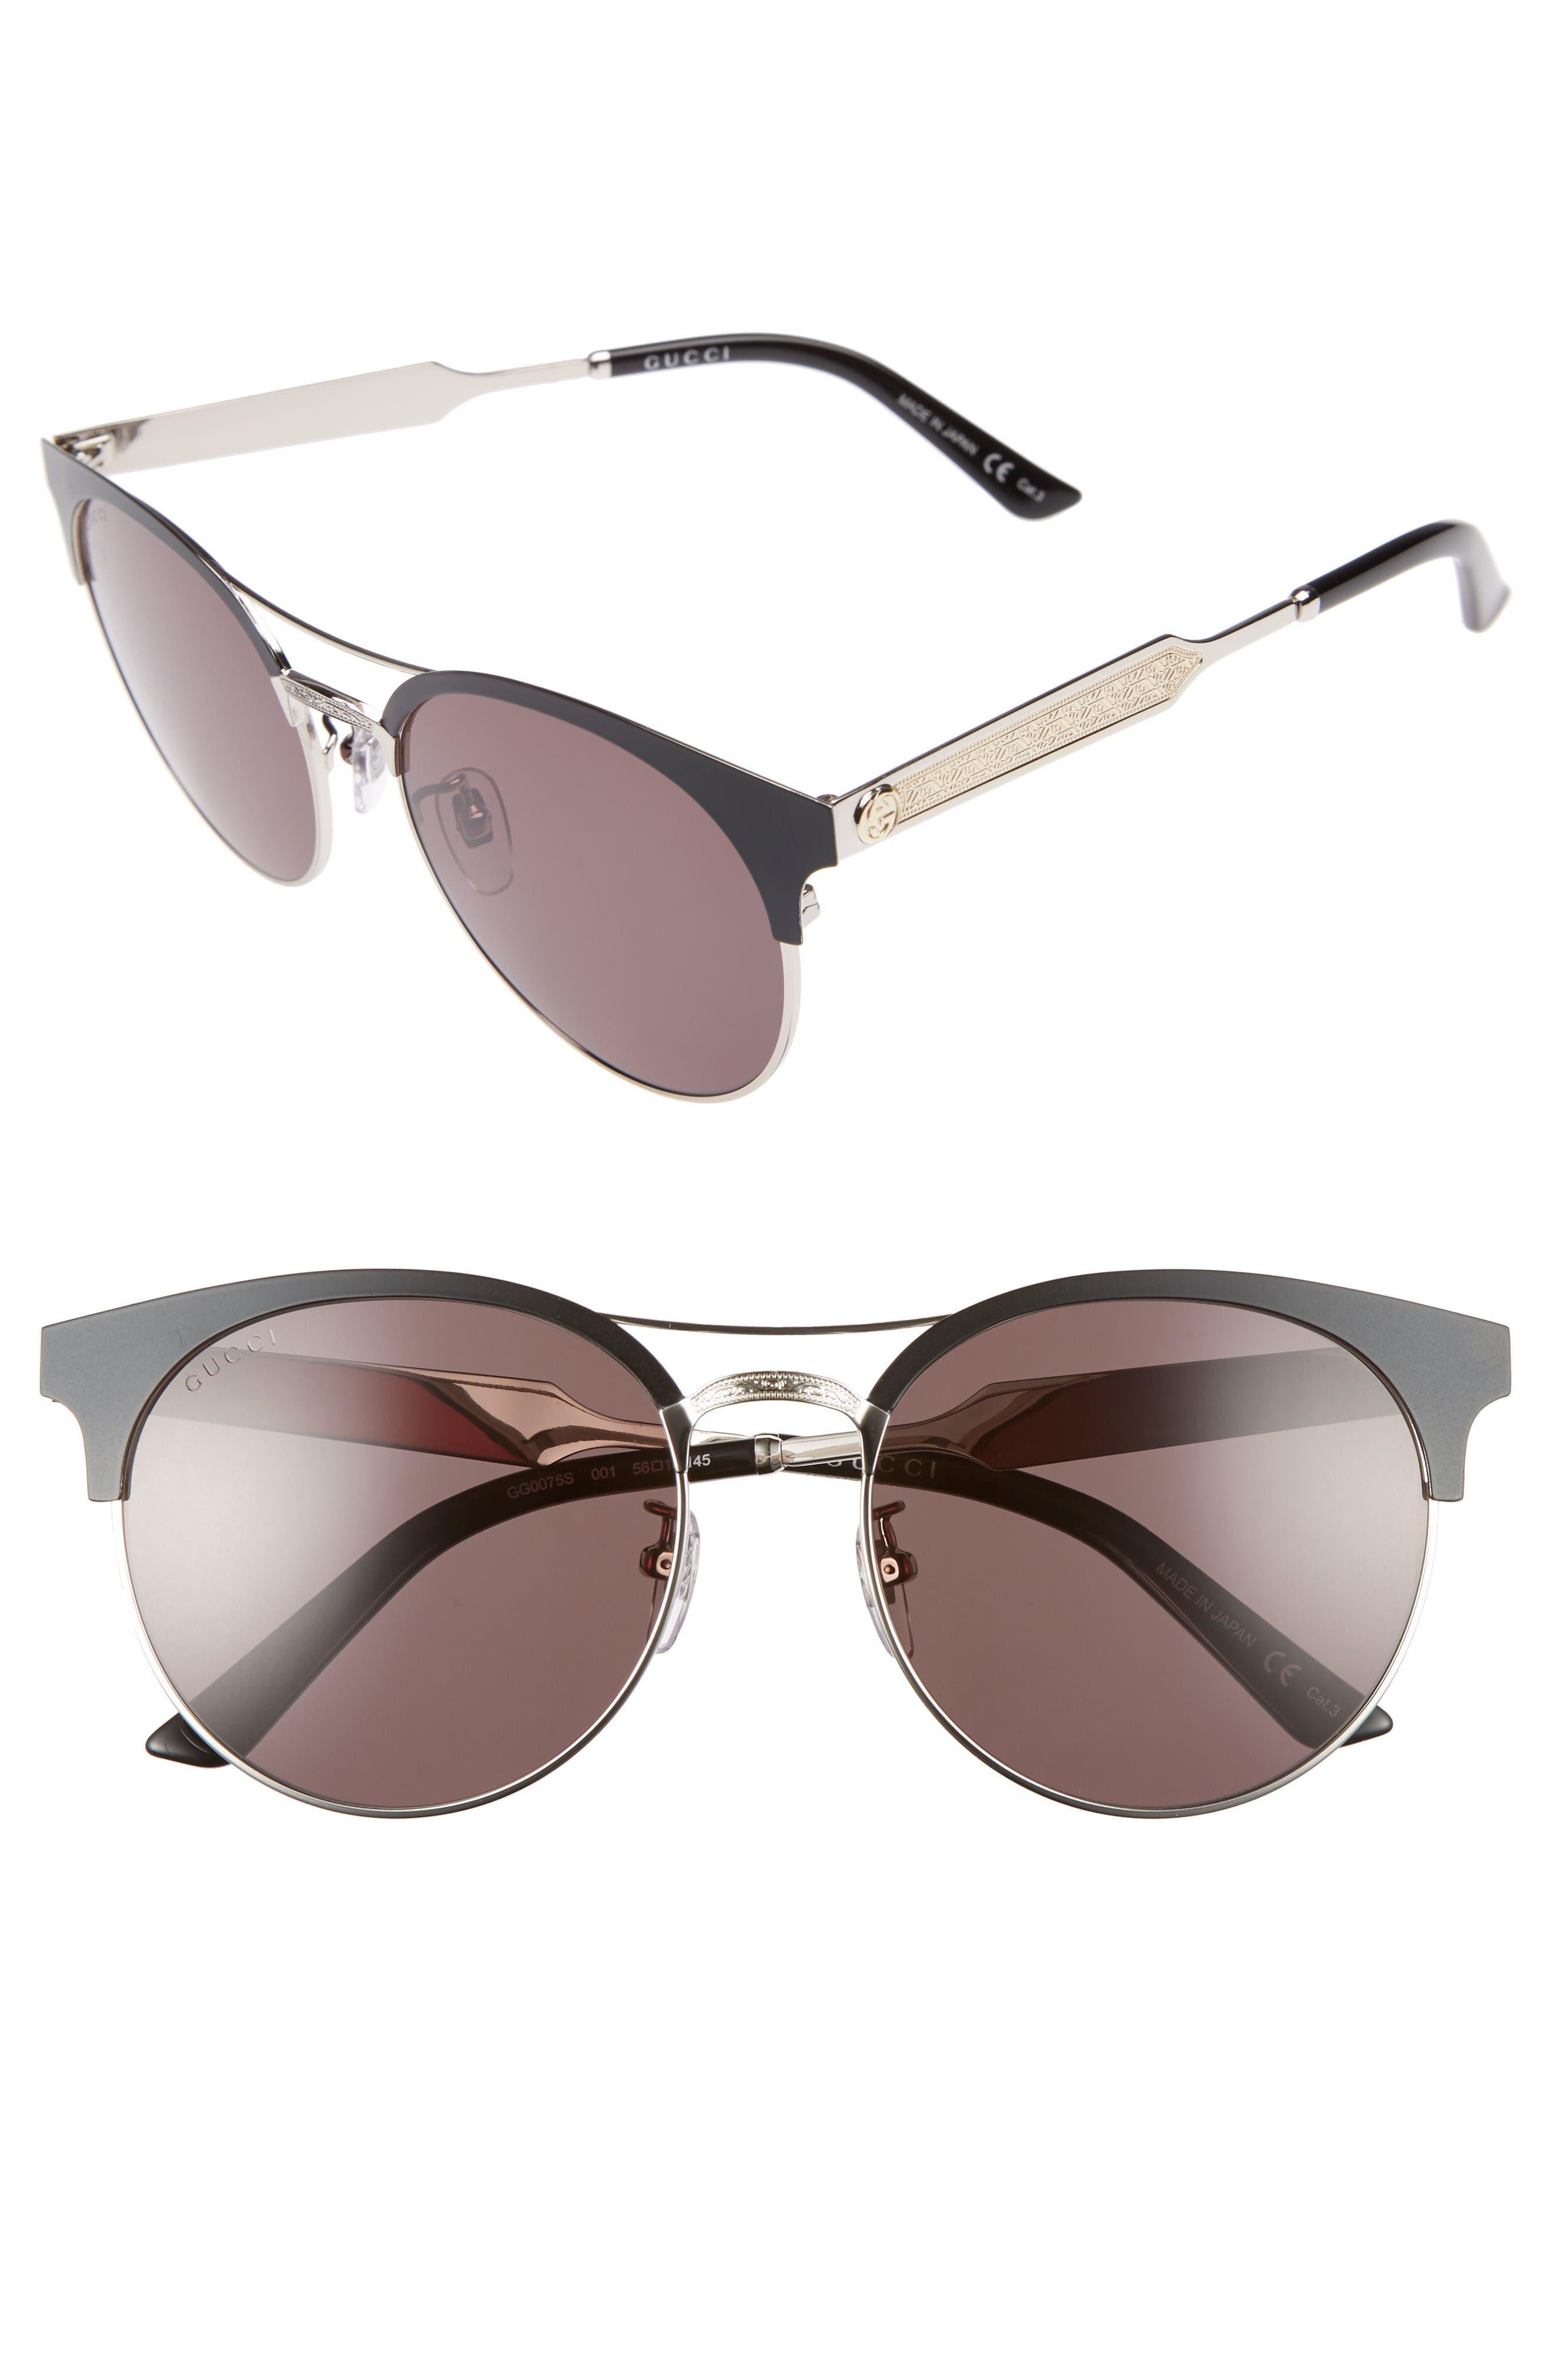 56mm Retro Sunglasses,                             Main thumbnail 1, color,                             Matte Black/ Grey